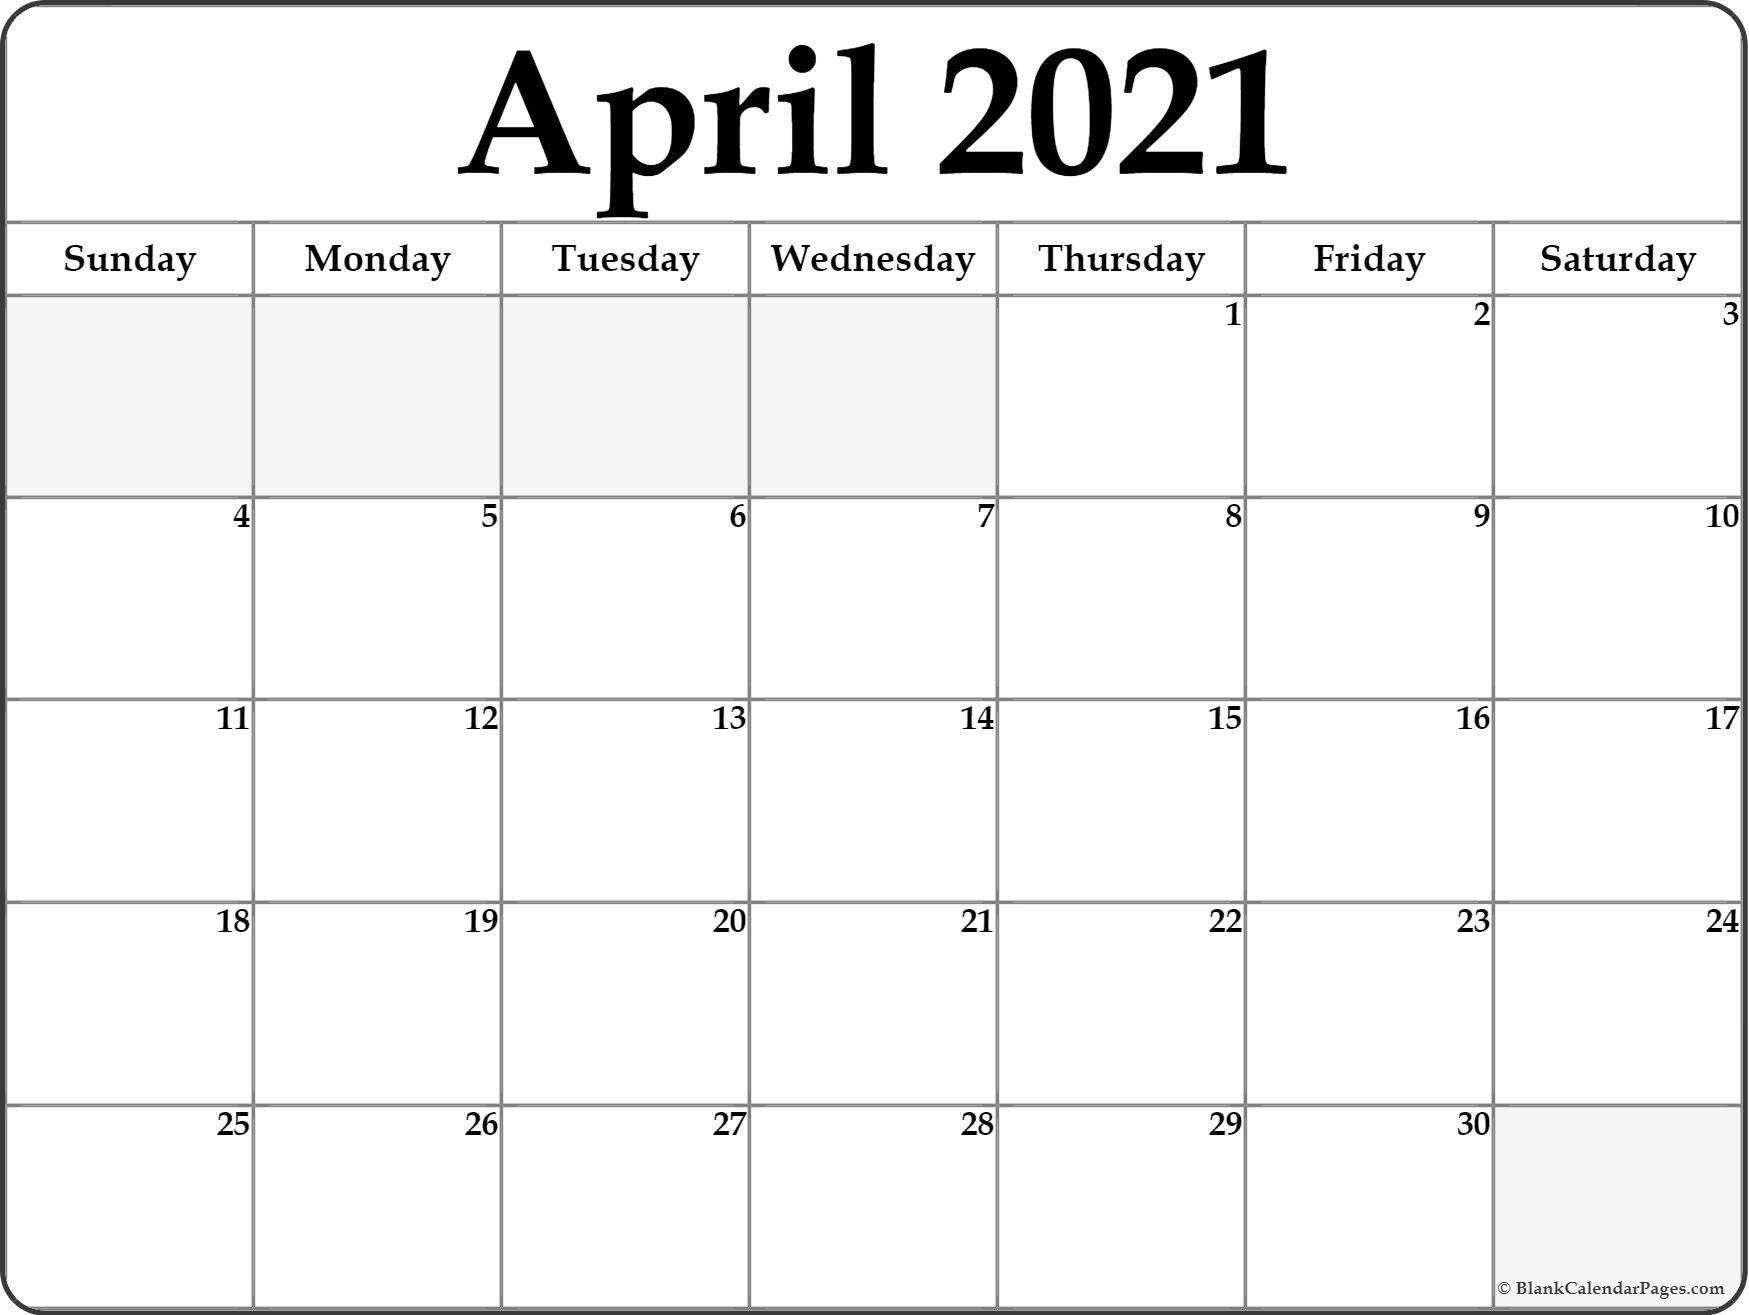 Weekly Calendar Template 2021 Blank For Agenda – Encouraged